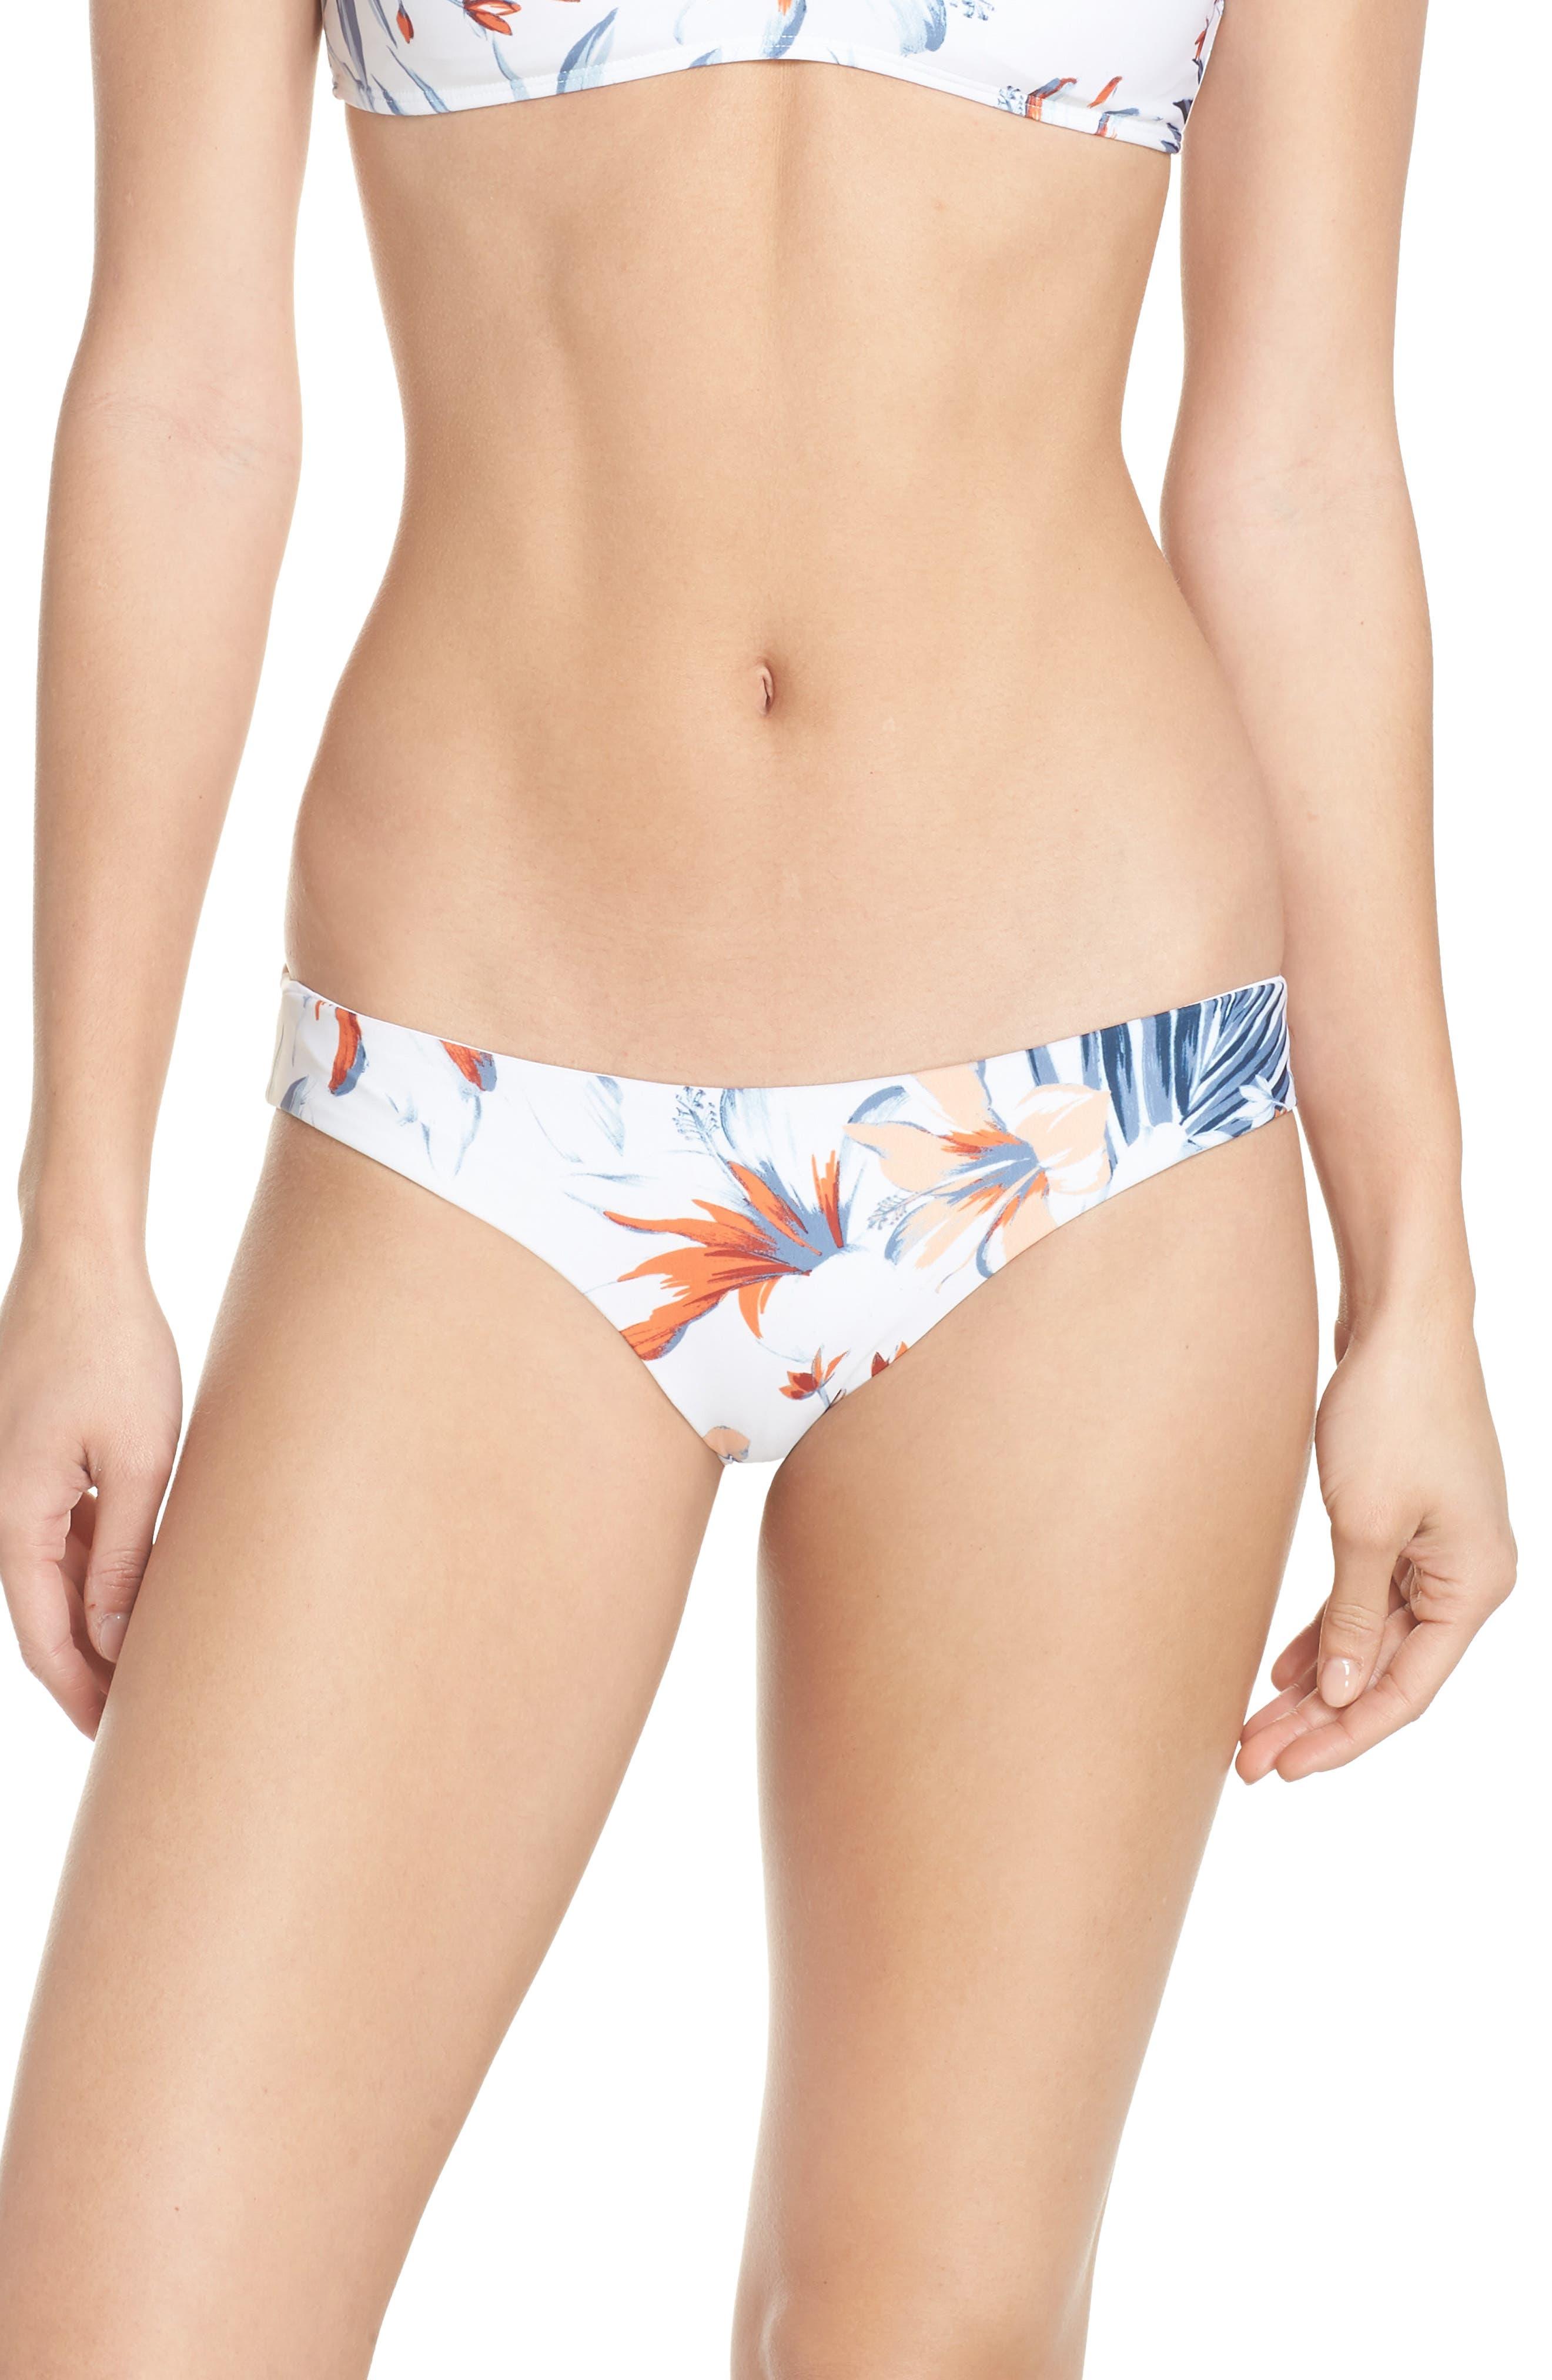 Sandy Classic Bikini Bottoms,                             Main thumbnail 1, color,                             BIRD OF PARADISE